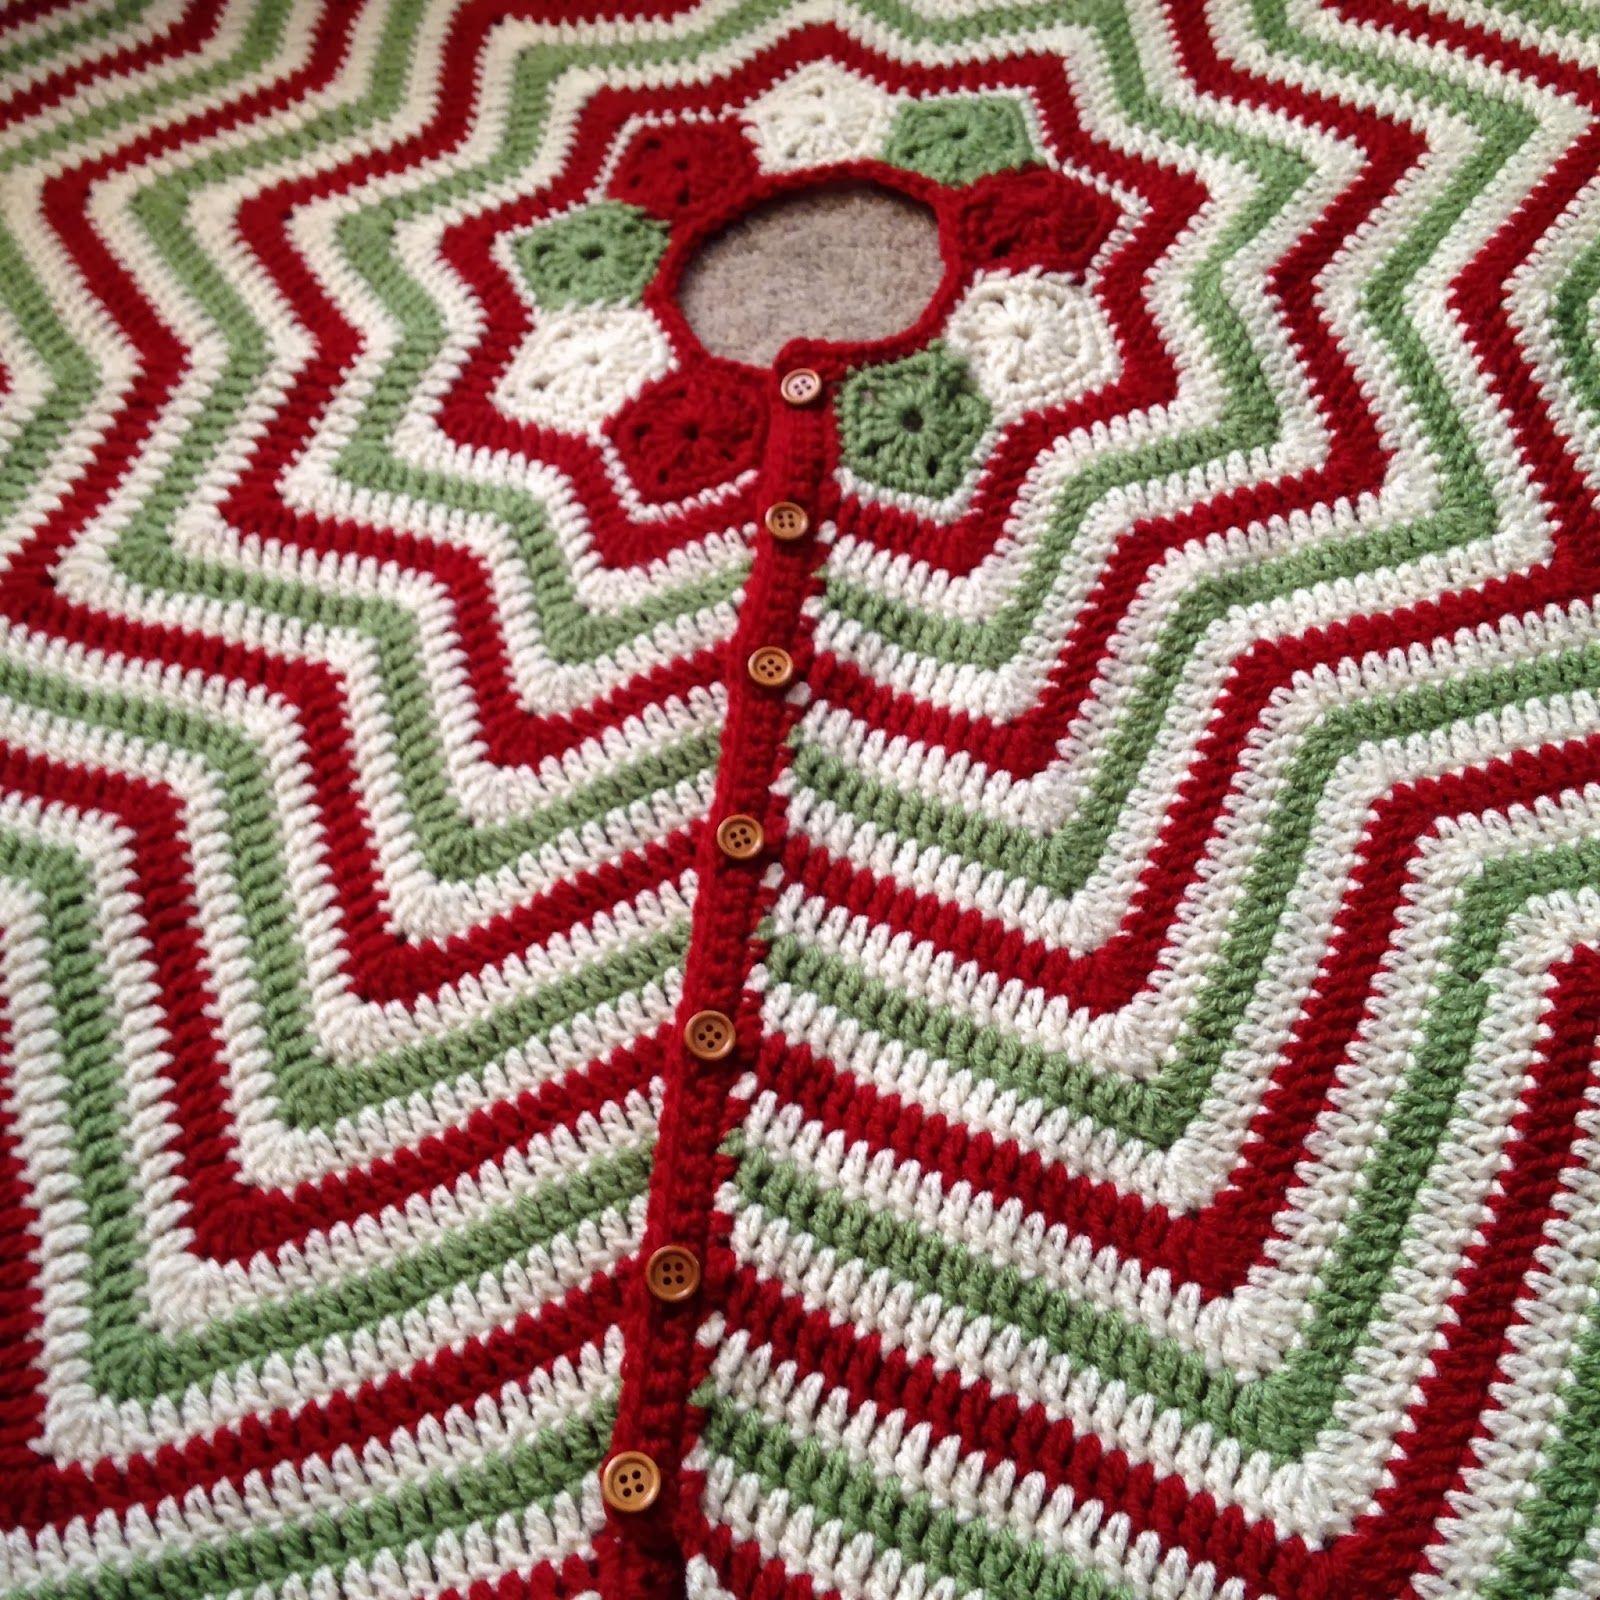 Christmas Tree Skirt | Wellen häkeln, Kostenlose häkelmuster und ...